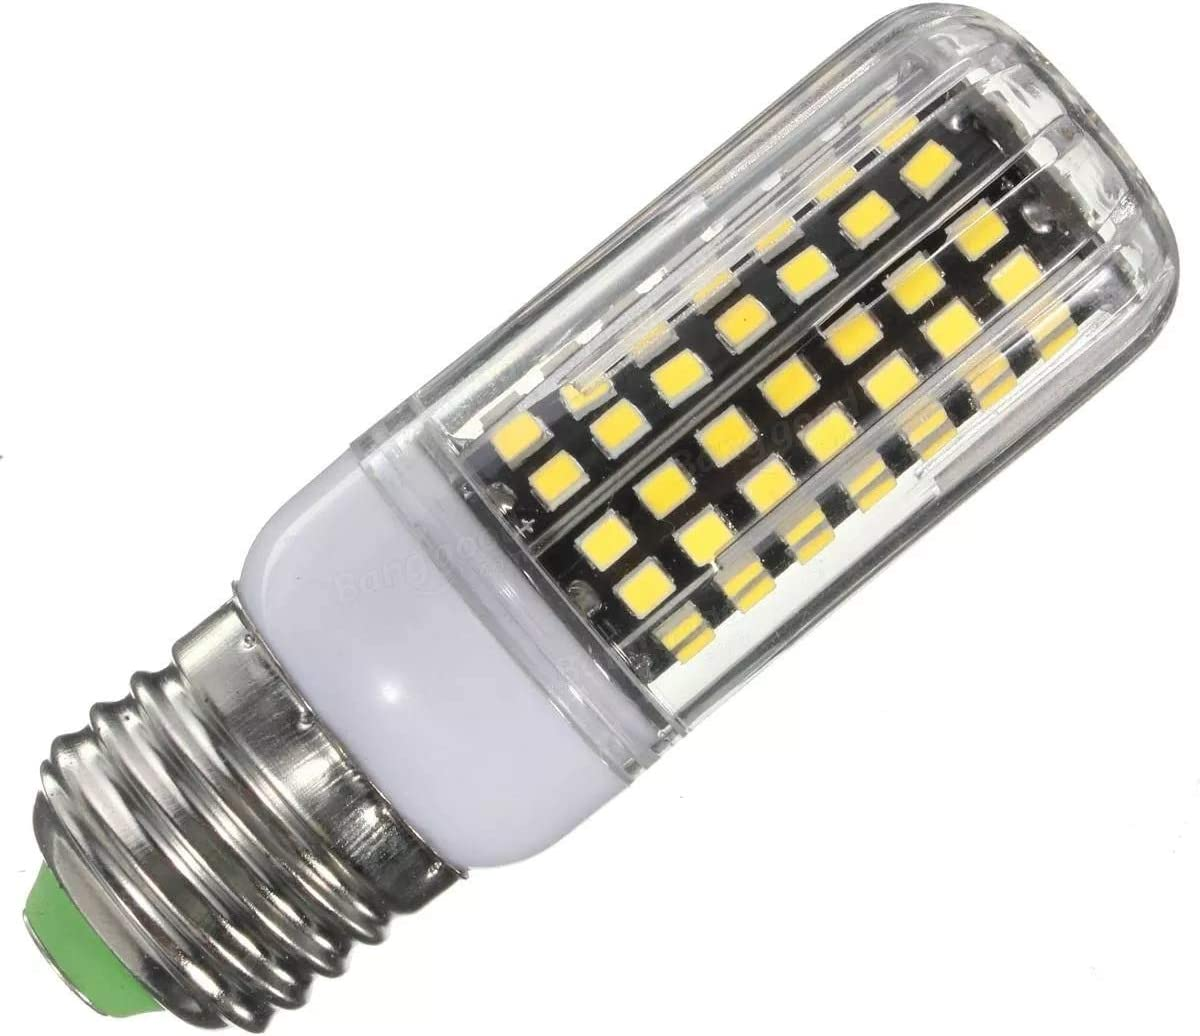 Inicio bombillas led E27 9W 112 SMD 2835 LED de la cubierta de maíz del bulbo de lámpara no regulables AC110V blanco blanco/caliente Bombillas (Talla : Warm White E27) Warm White E27